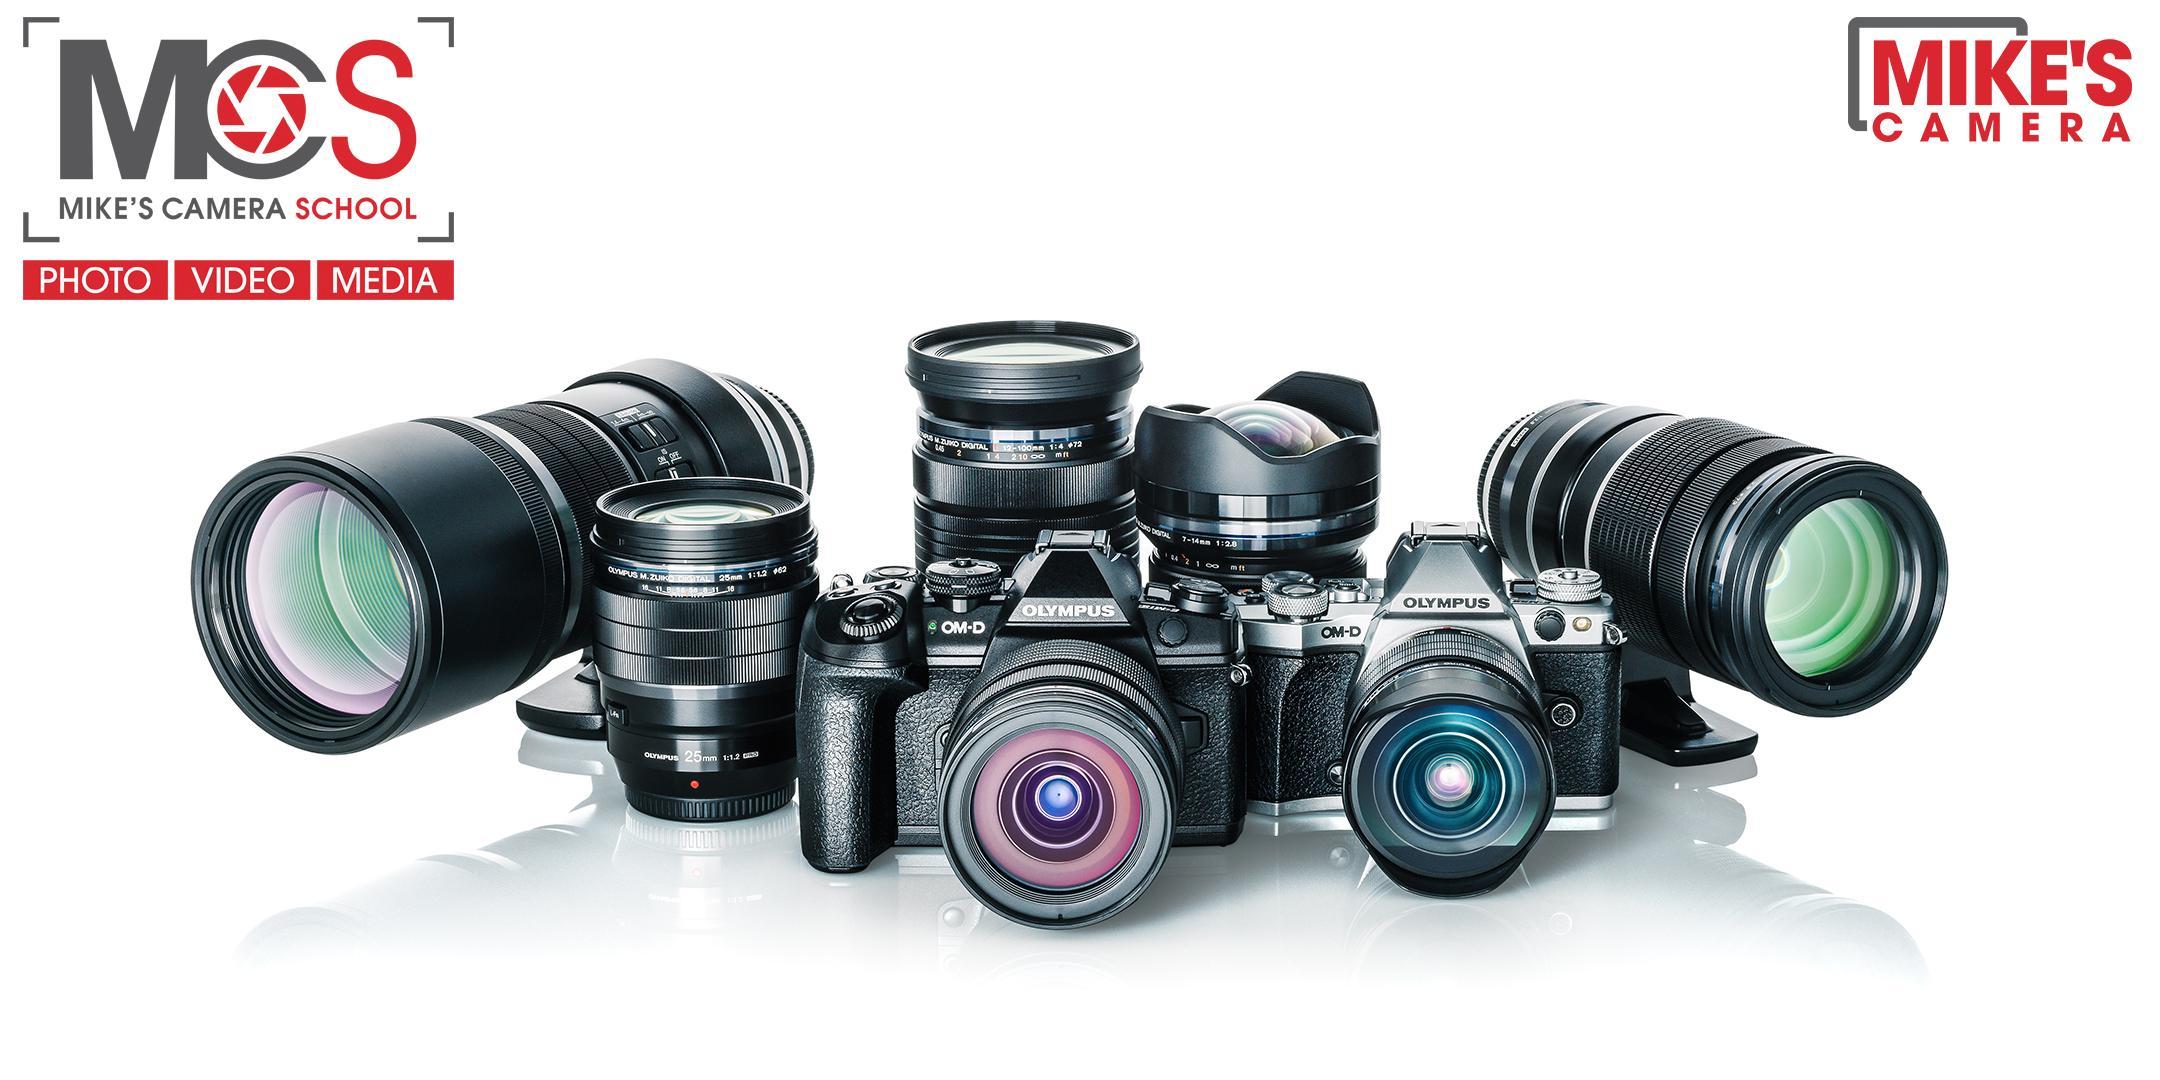 Olympus Interchangeable Lens Camera- Menlo Pa